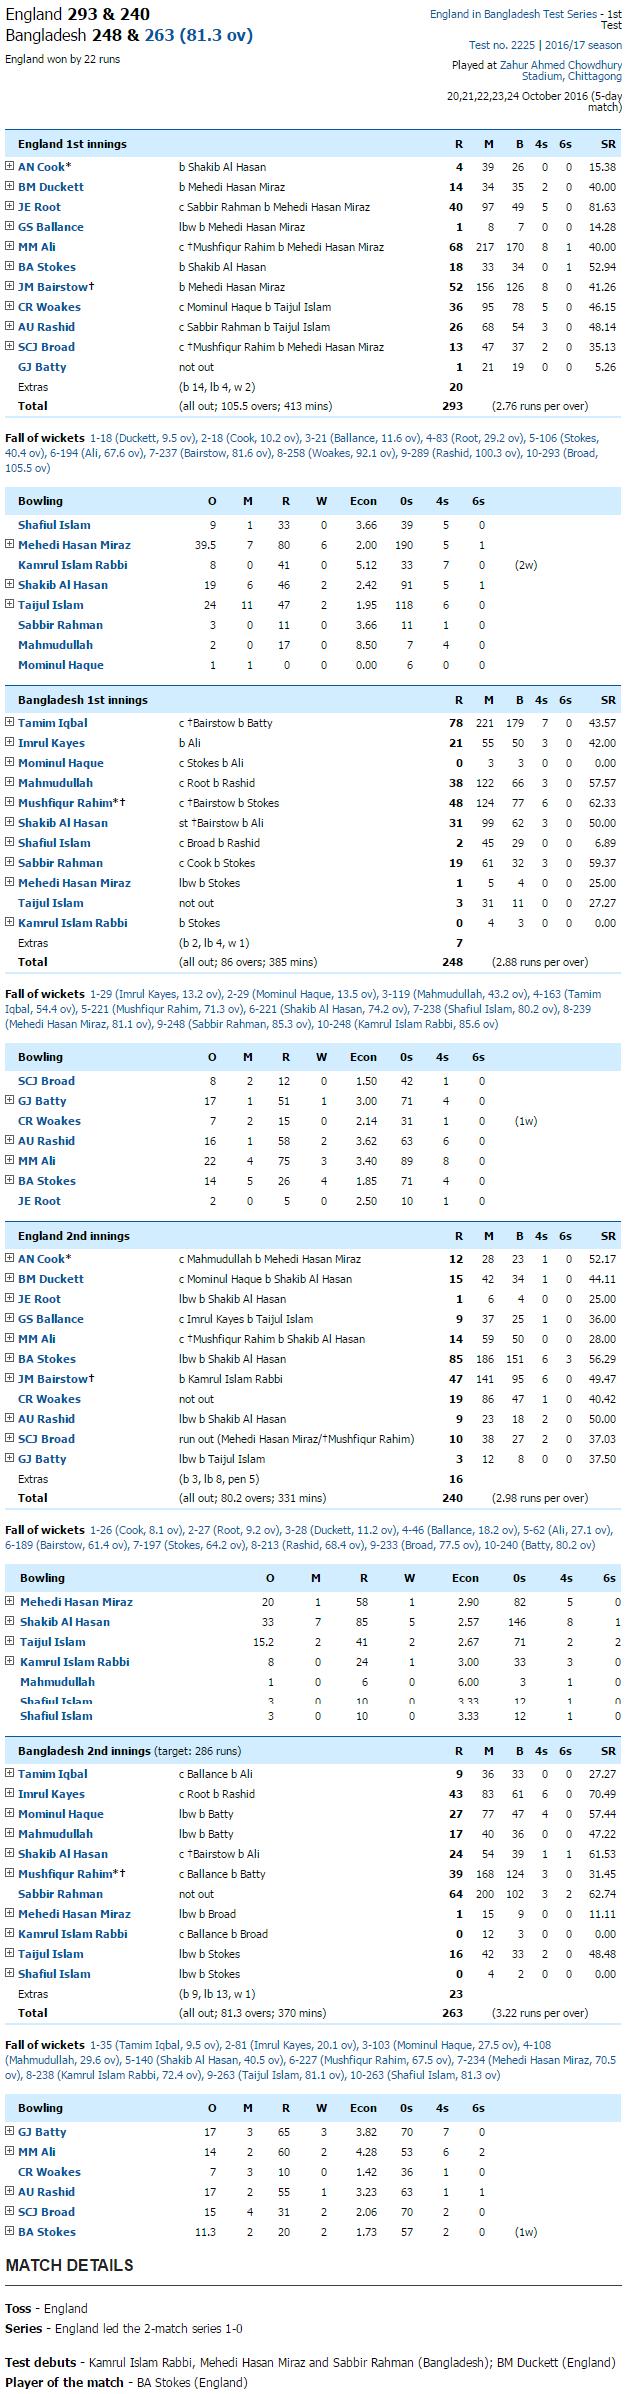 england-tour-of-bangladesh-1st-test-bangladesh-v-england-at-chittagong-oct-20-24-2016